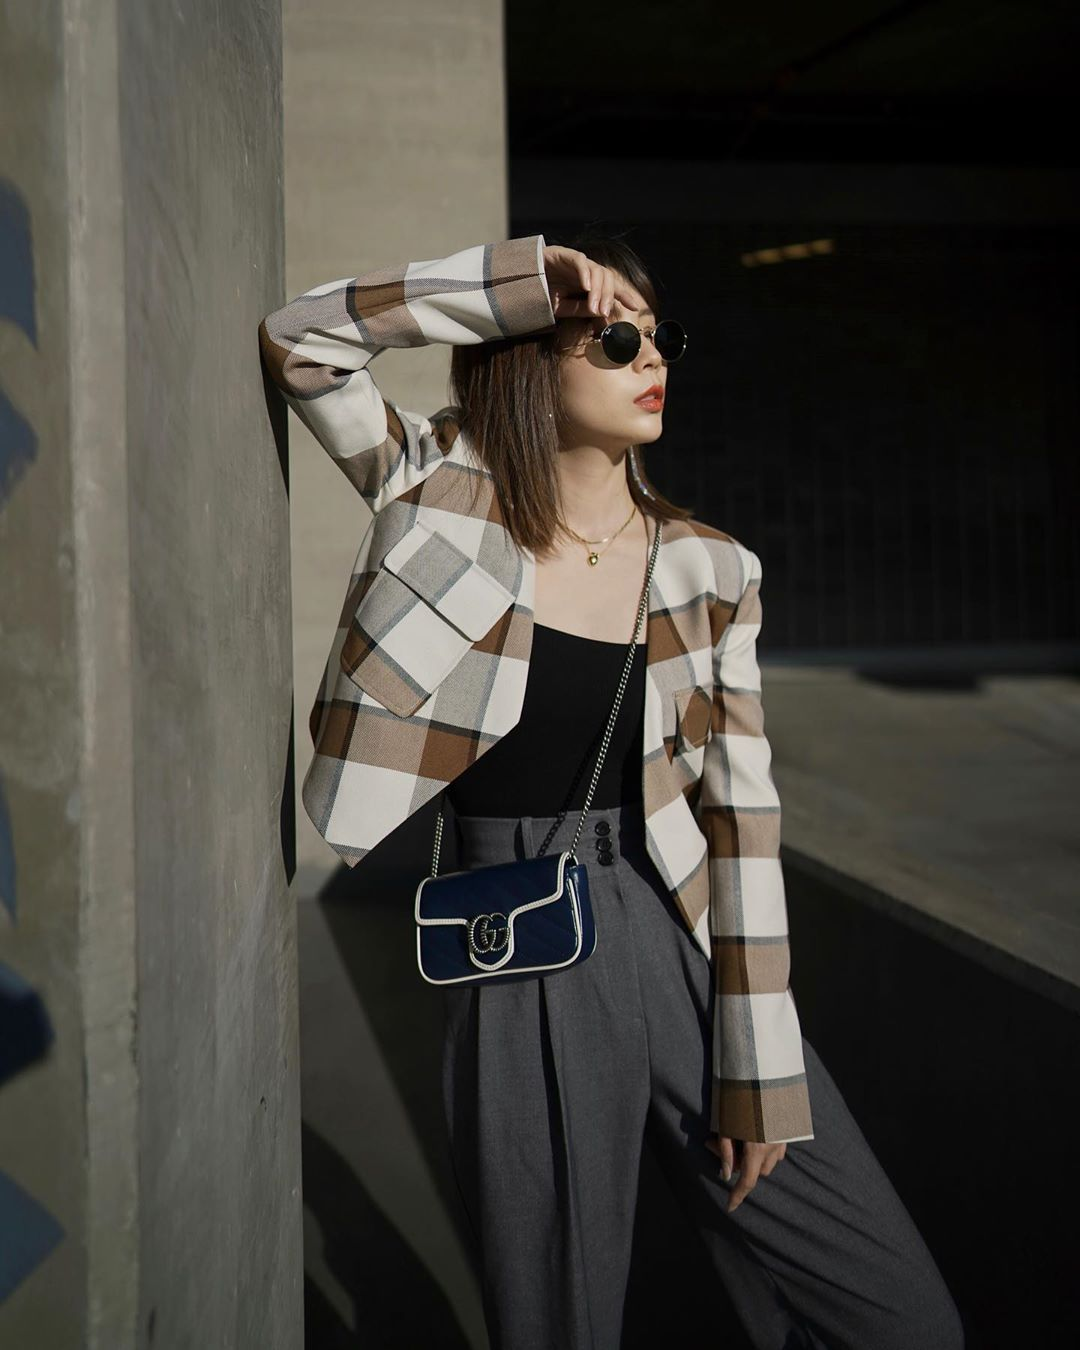 Dress code semi formal - áo khoác kẻ ô